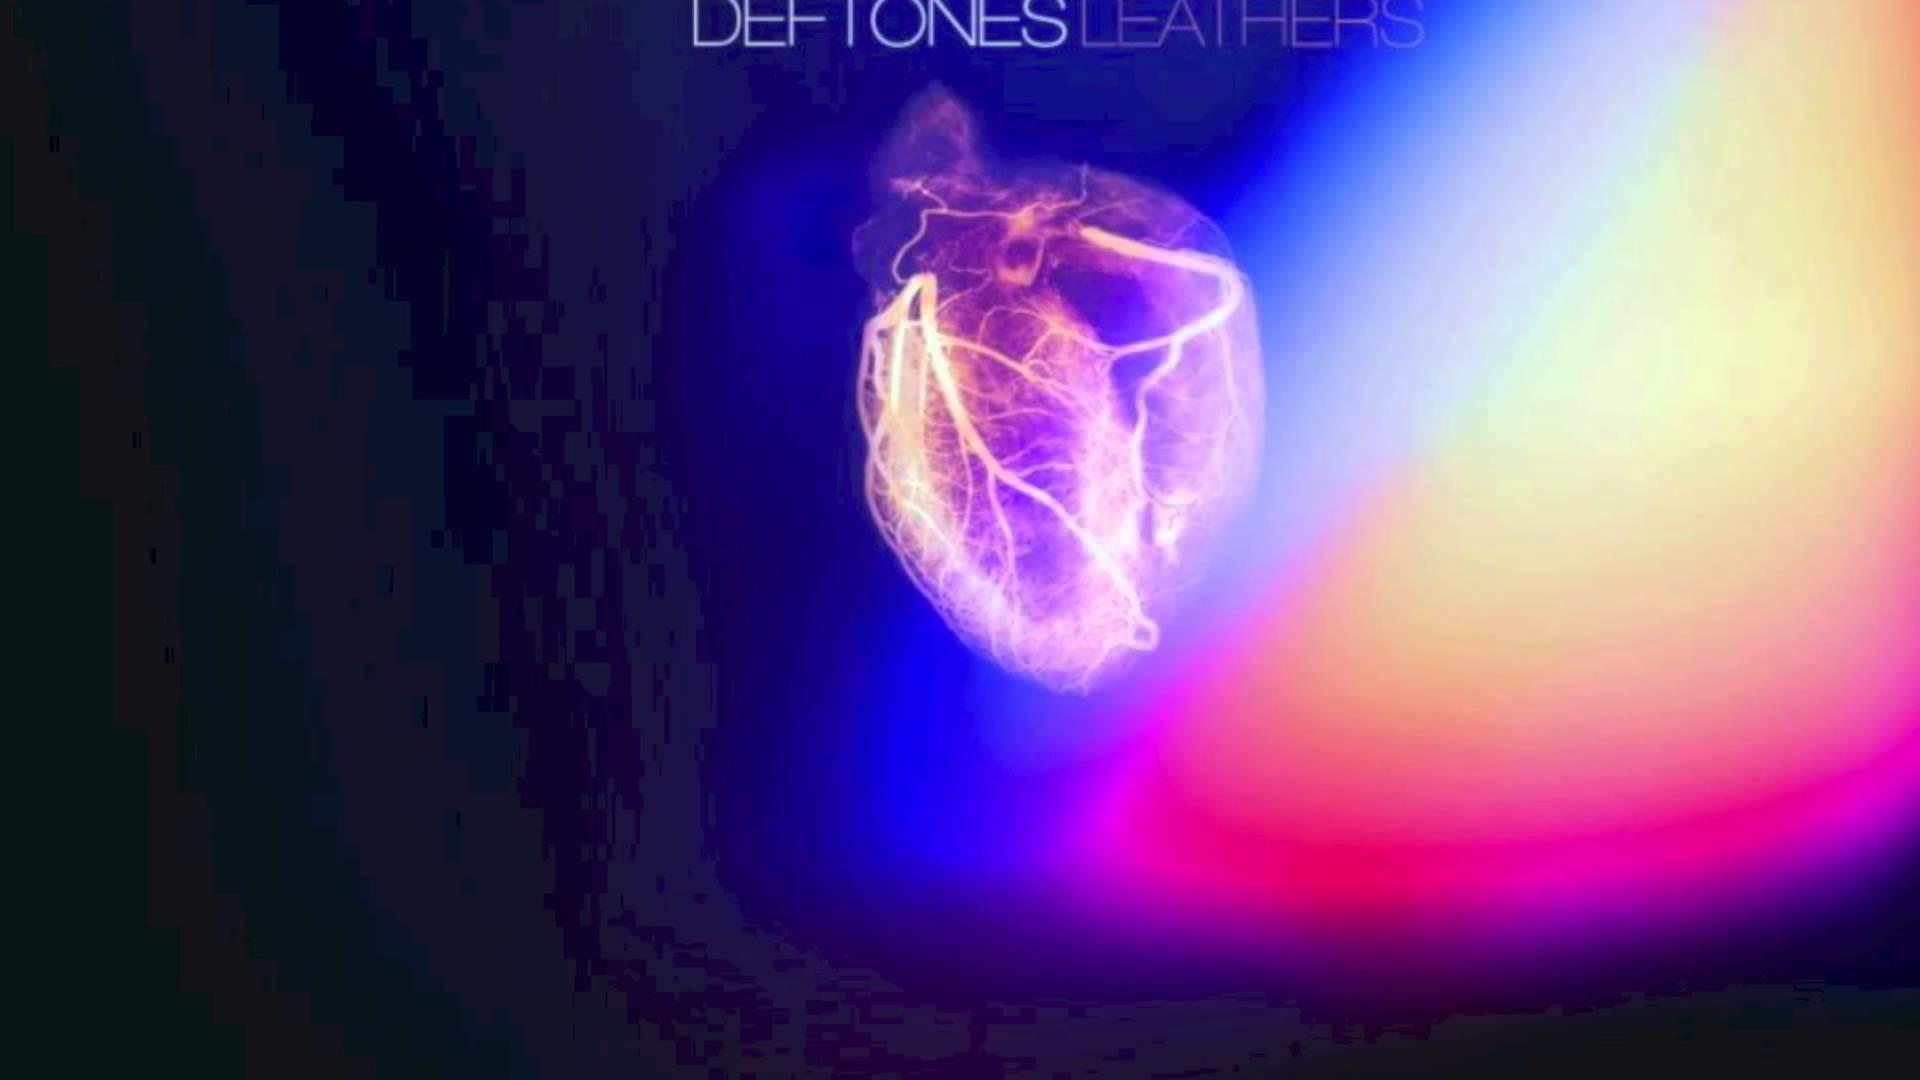 Deftones -Leather